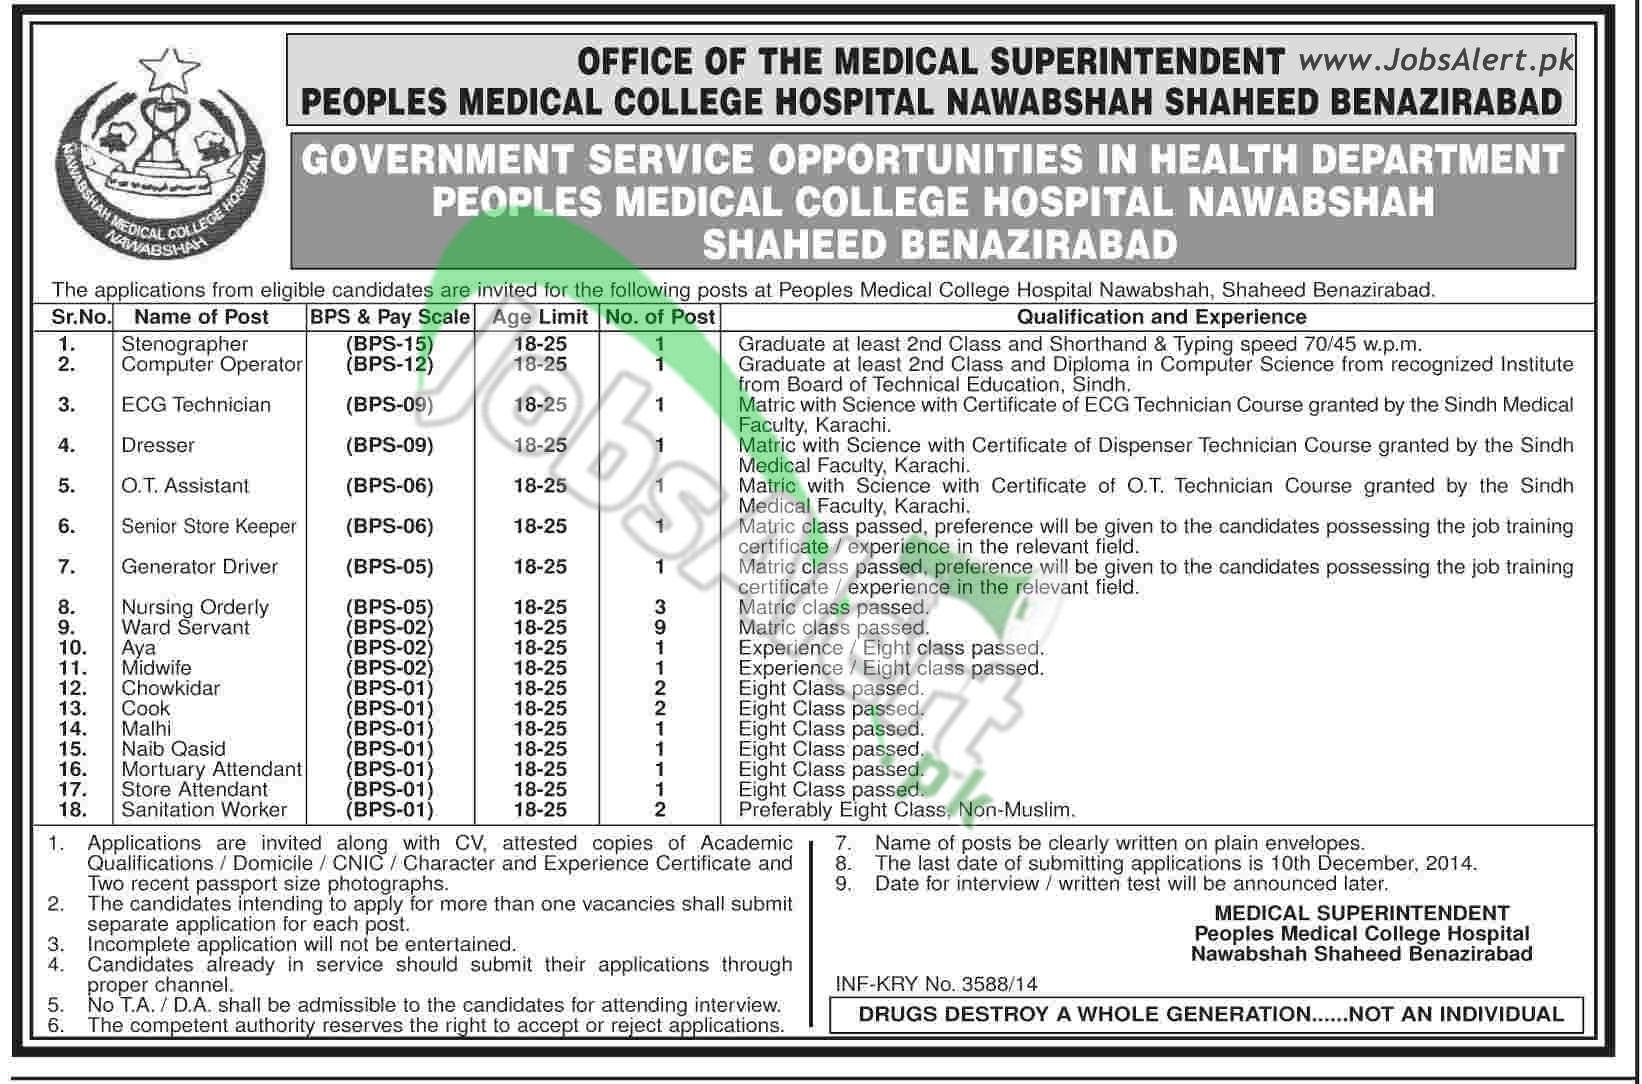 Peoples Medical College Hospital Nawabshah Benazirabad